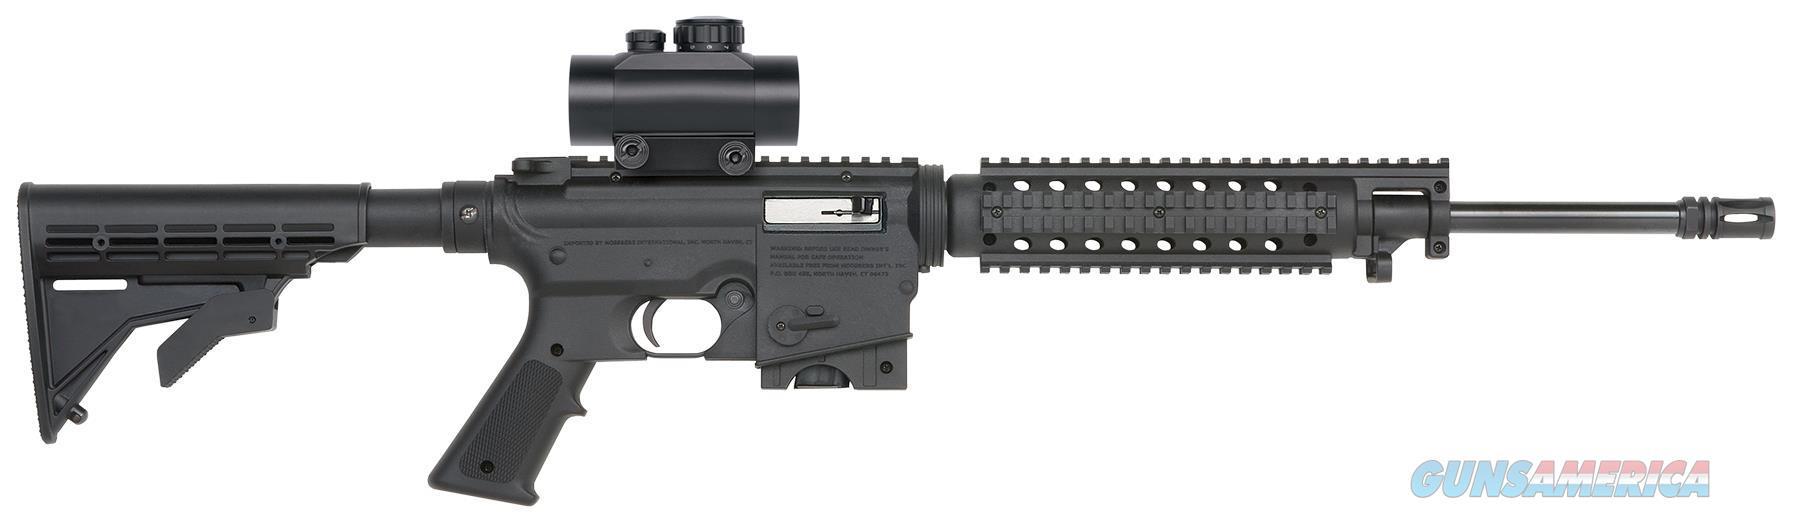 Mossberg 715T 22Lr 16.25''  11-Rd Collapsible Stock Red Dot 37232  Guns > Rifles > MN Misc Rifles